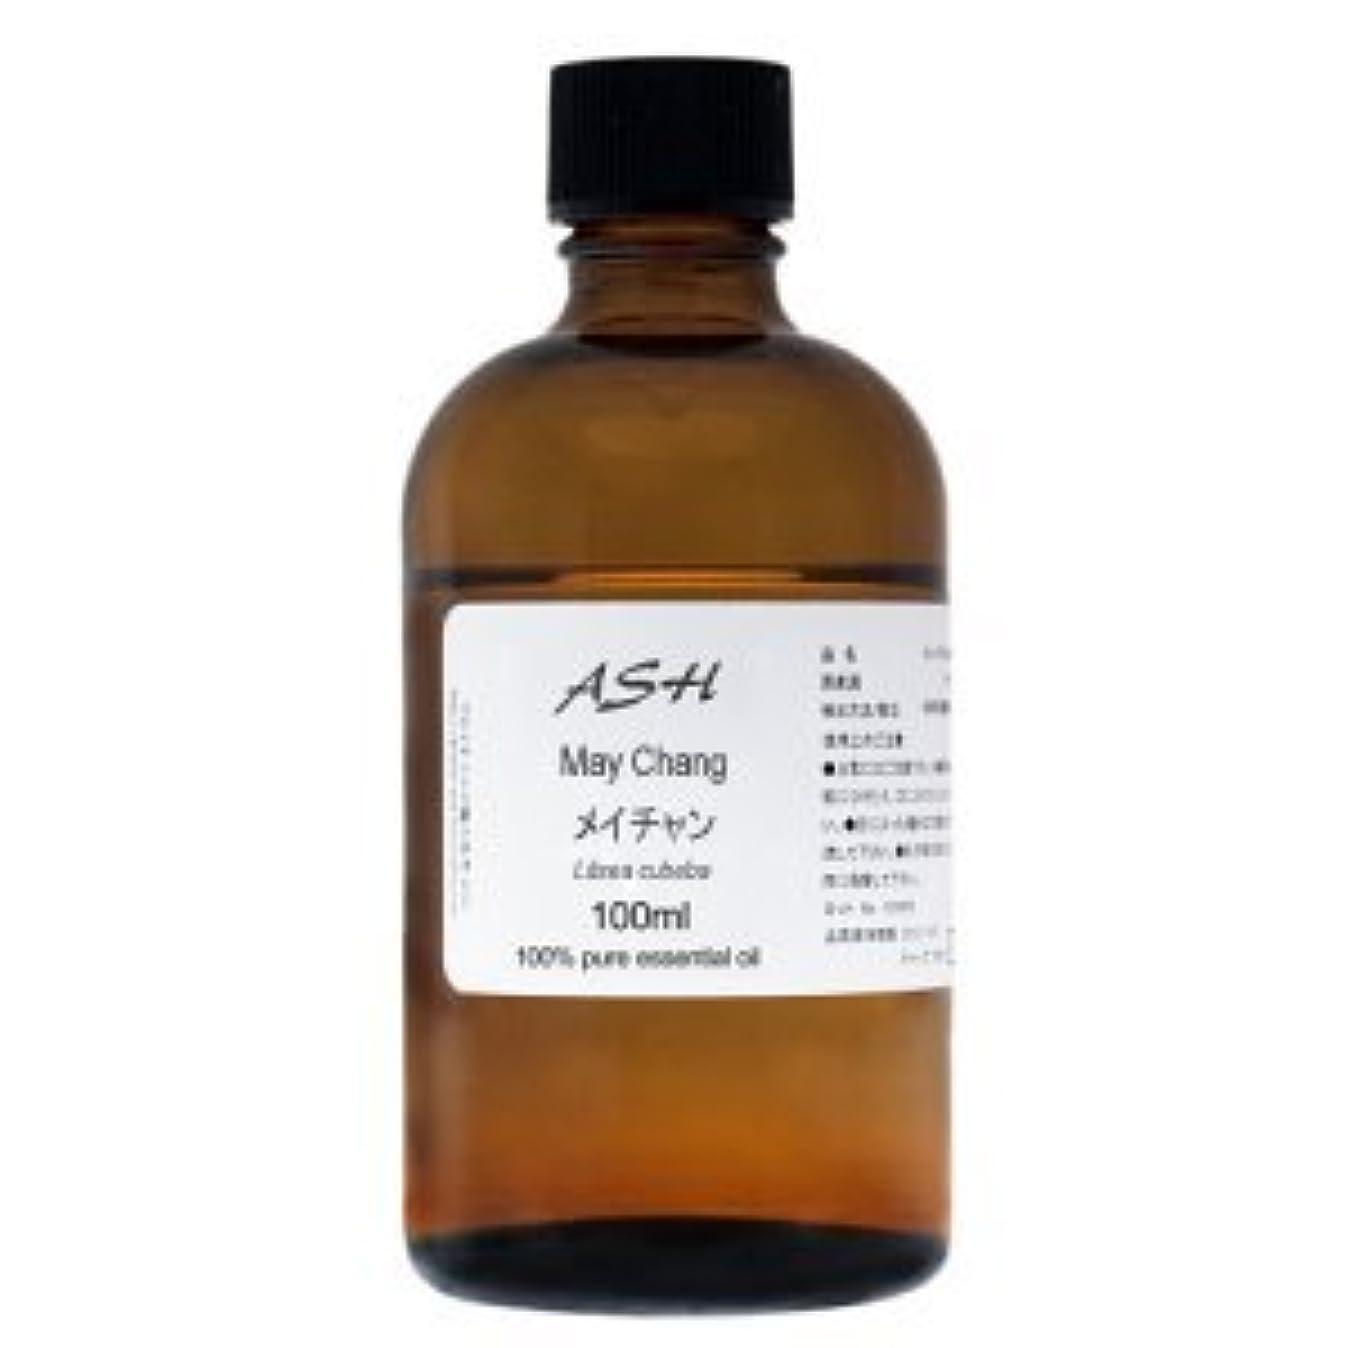 ASH メイチャン エッセンシャルオイル 100ml AEAJ表示基準適合認定精油